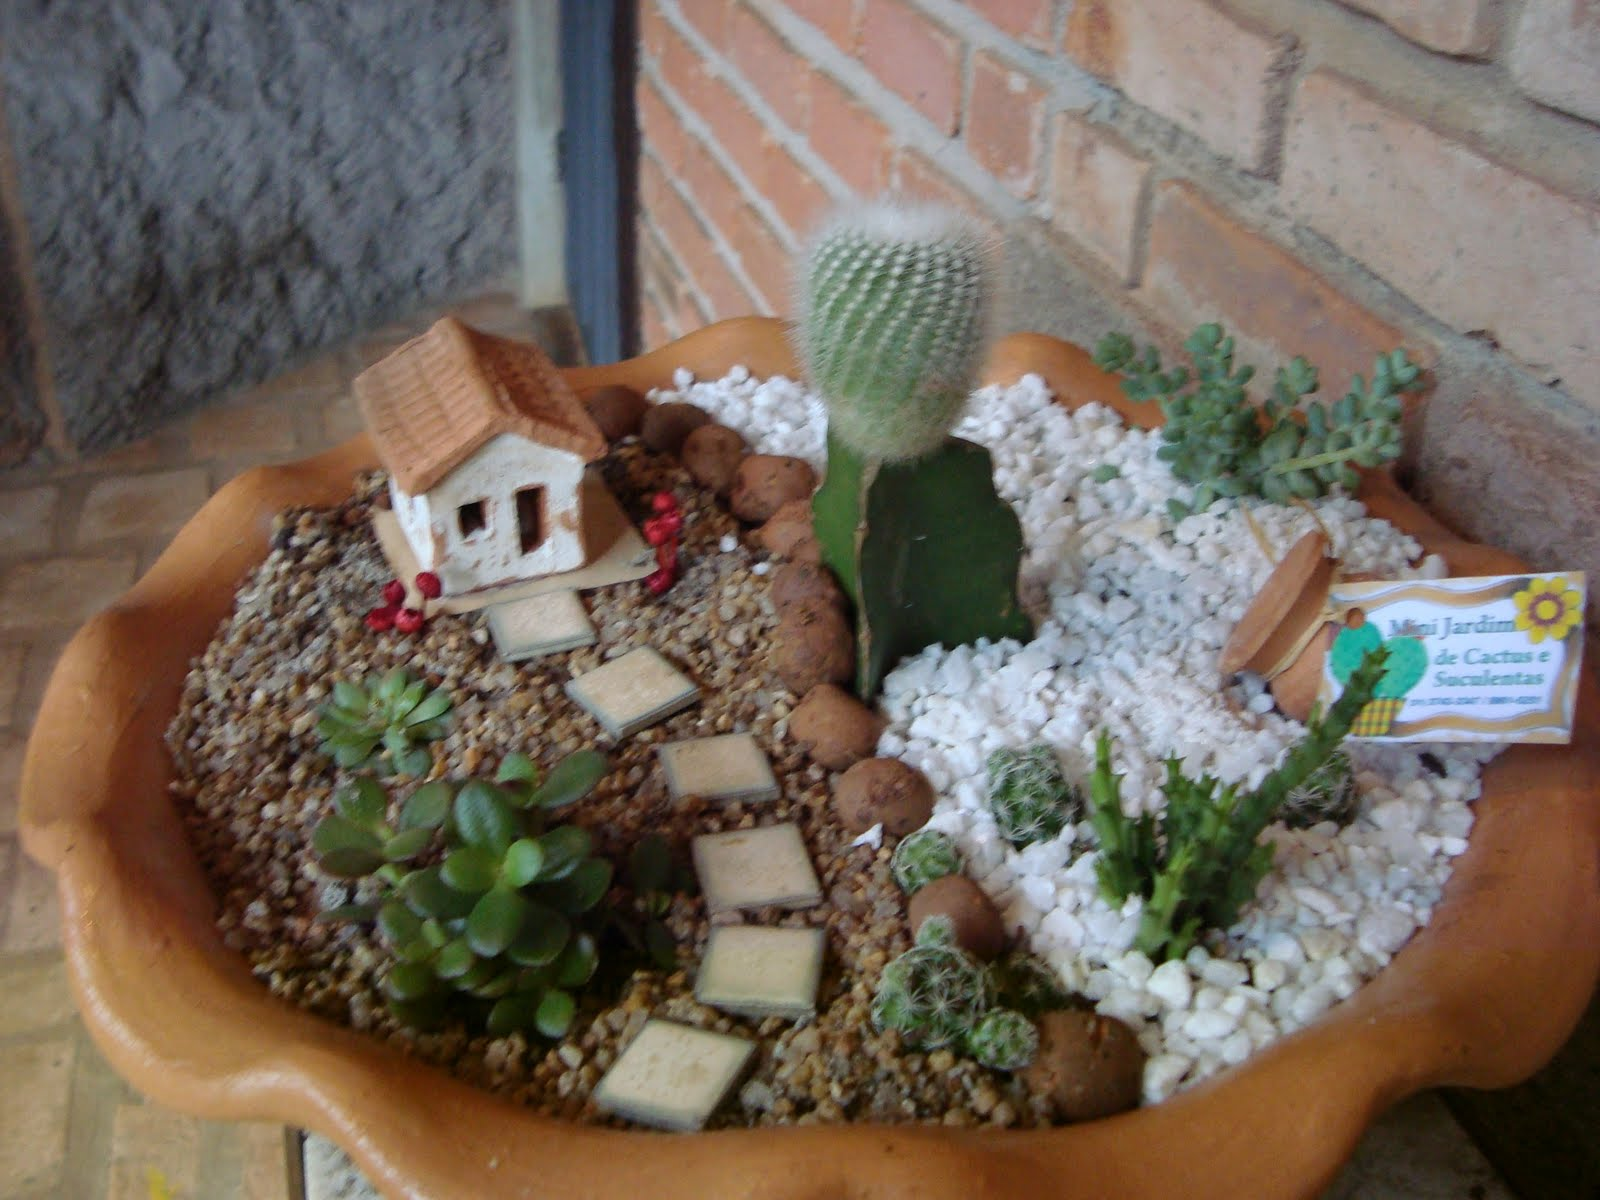 Camila calvet mini jardins - Plantas de exterior faciles de cuidar ...